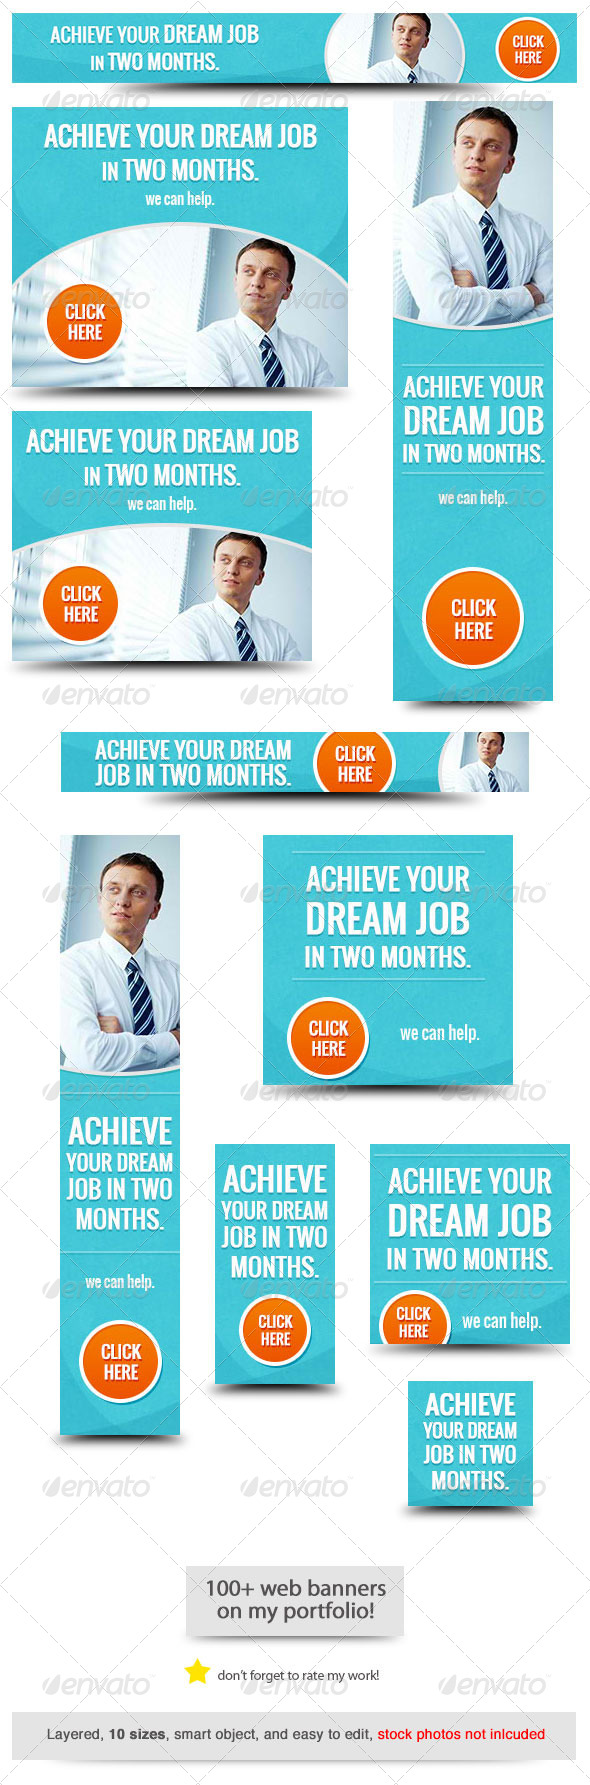 GraphicRiver Best Job Web Banner Design 8314011